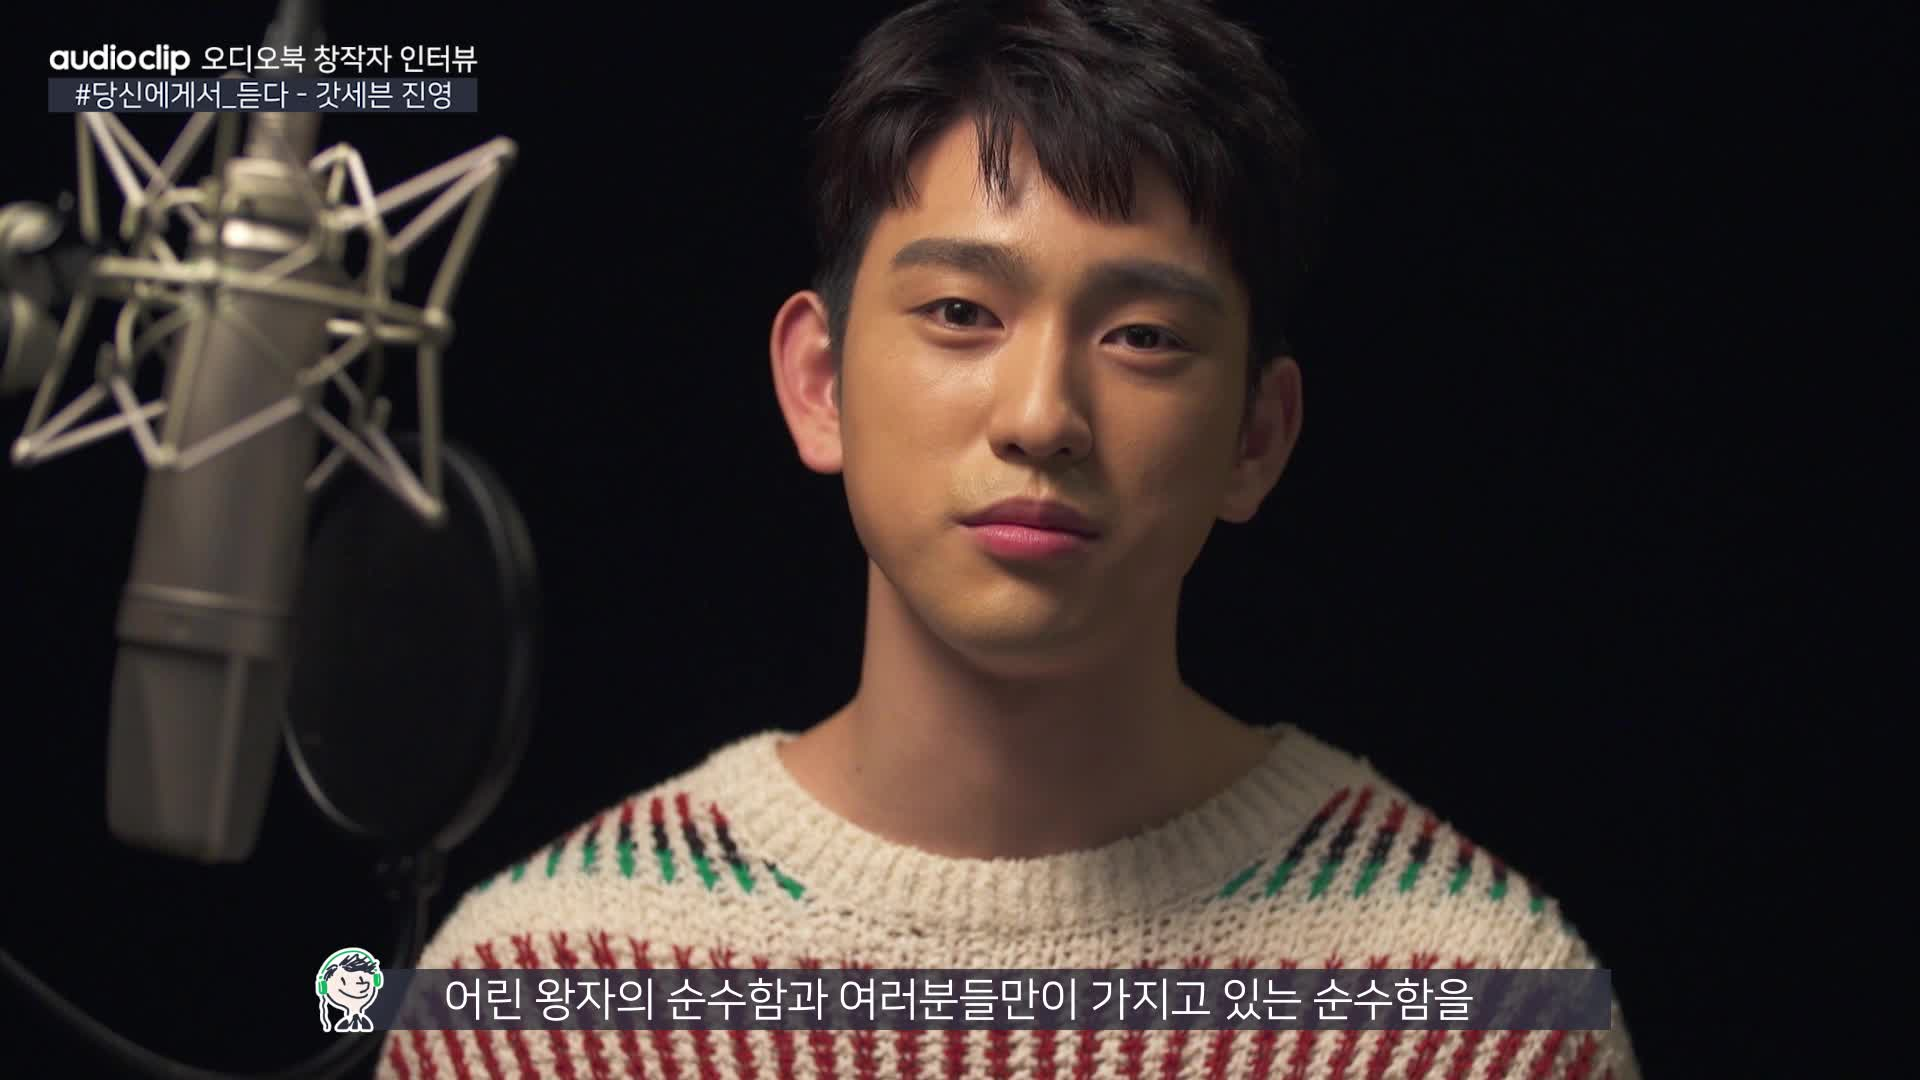 audio clip오디오북 창작자 인터뷰 #당신에게서_듣다 - GOT7 진영